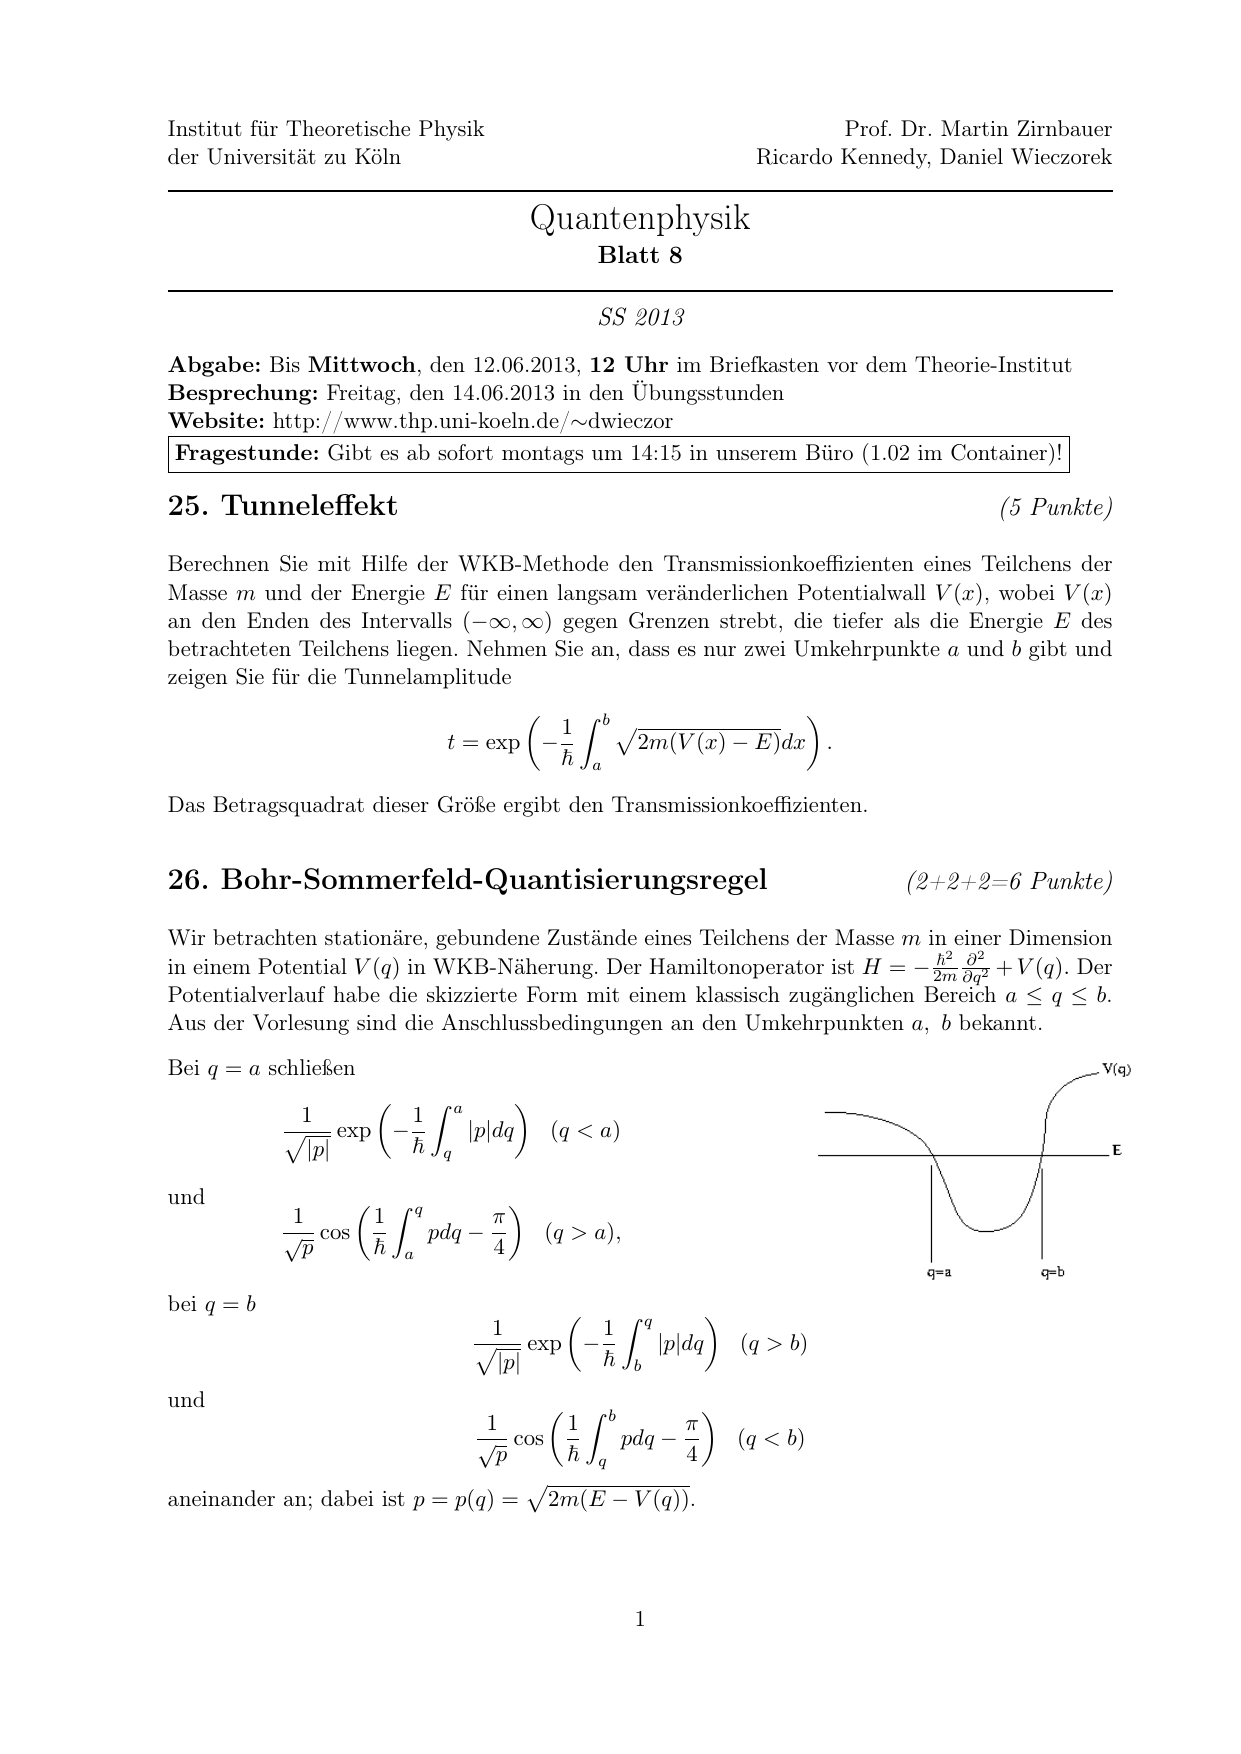 Quantenphysik - Universität zu Köln